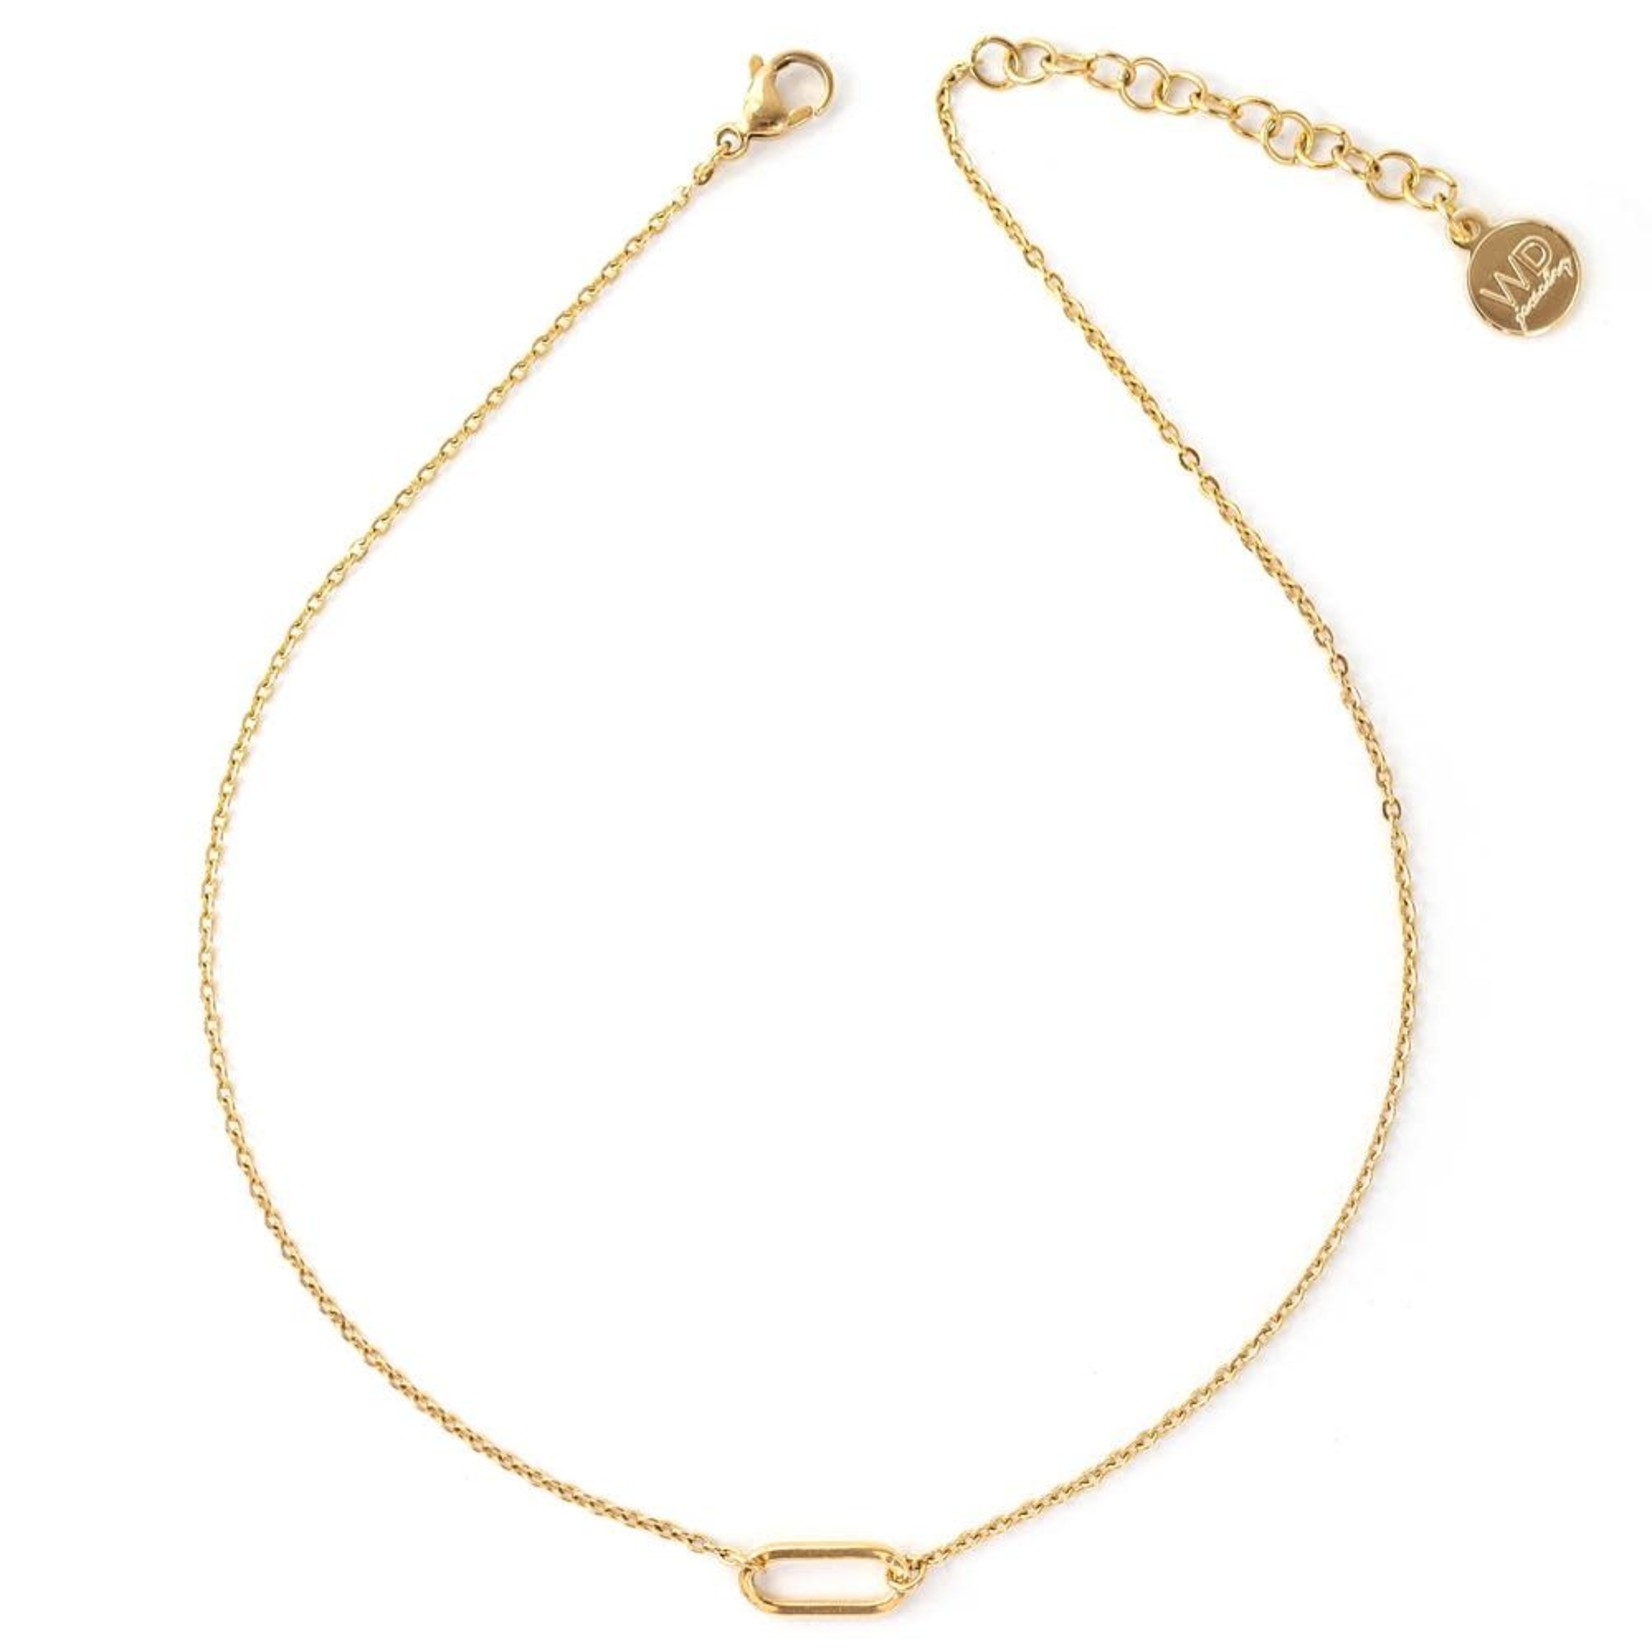 Welldunn jewelry Wellduun collier RANDALL or